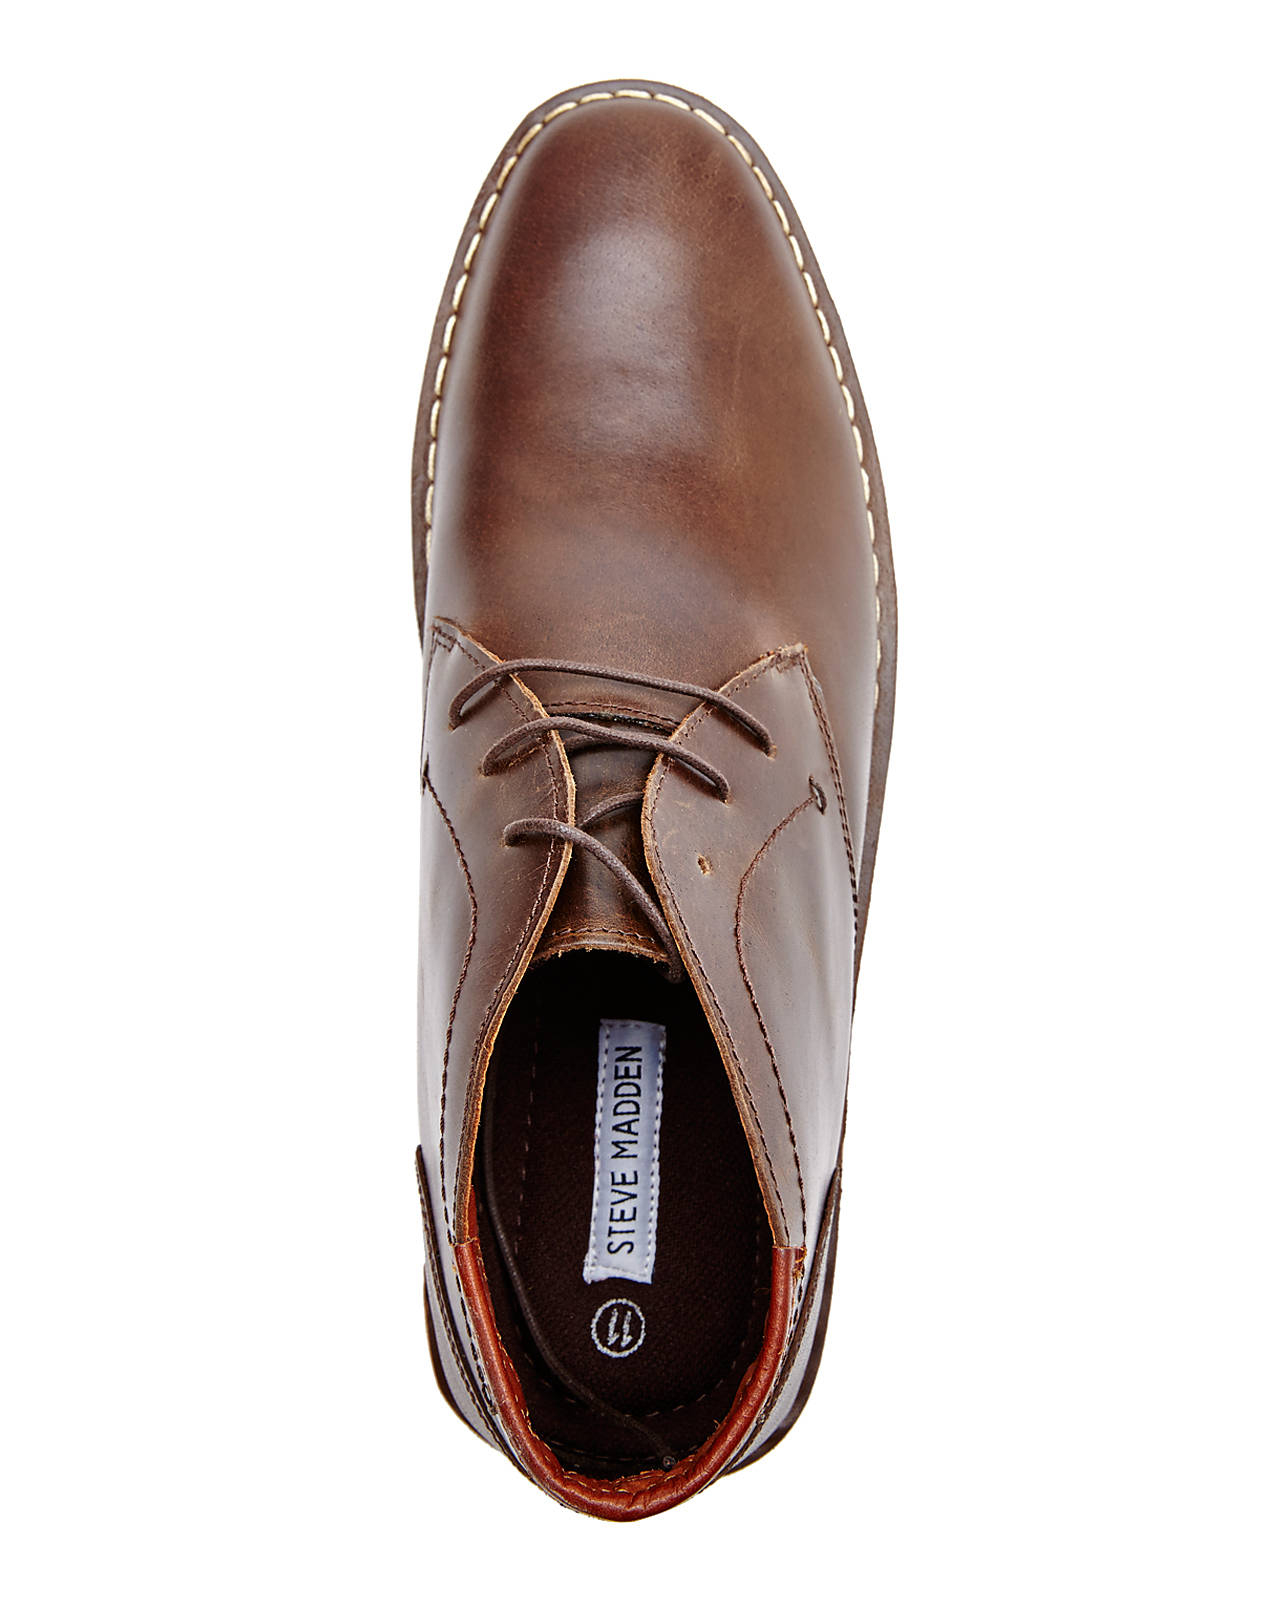 steve madden brown hestonn chukka boots in brown for